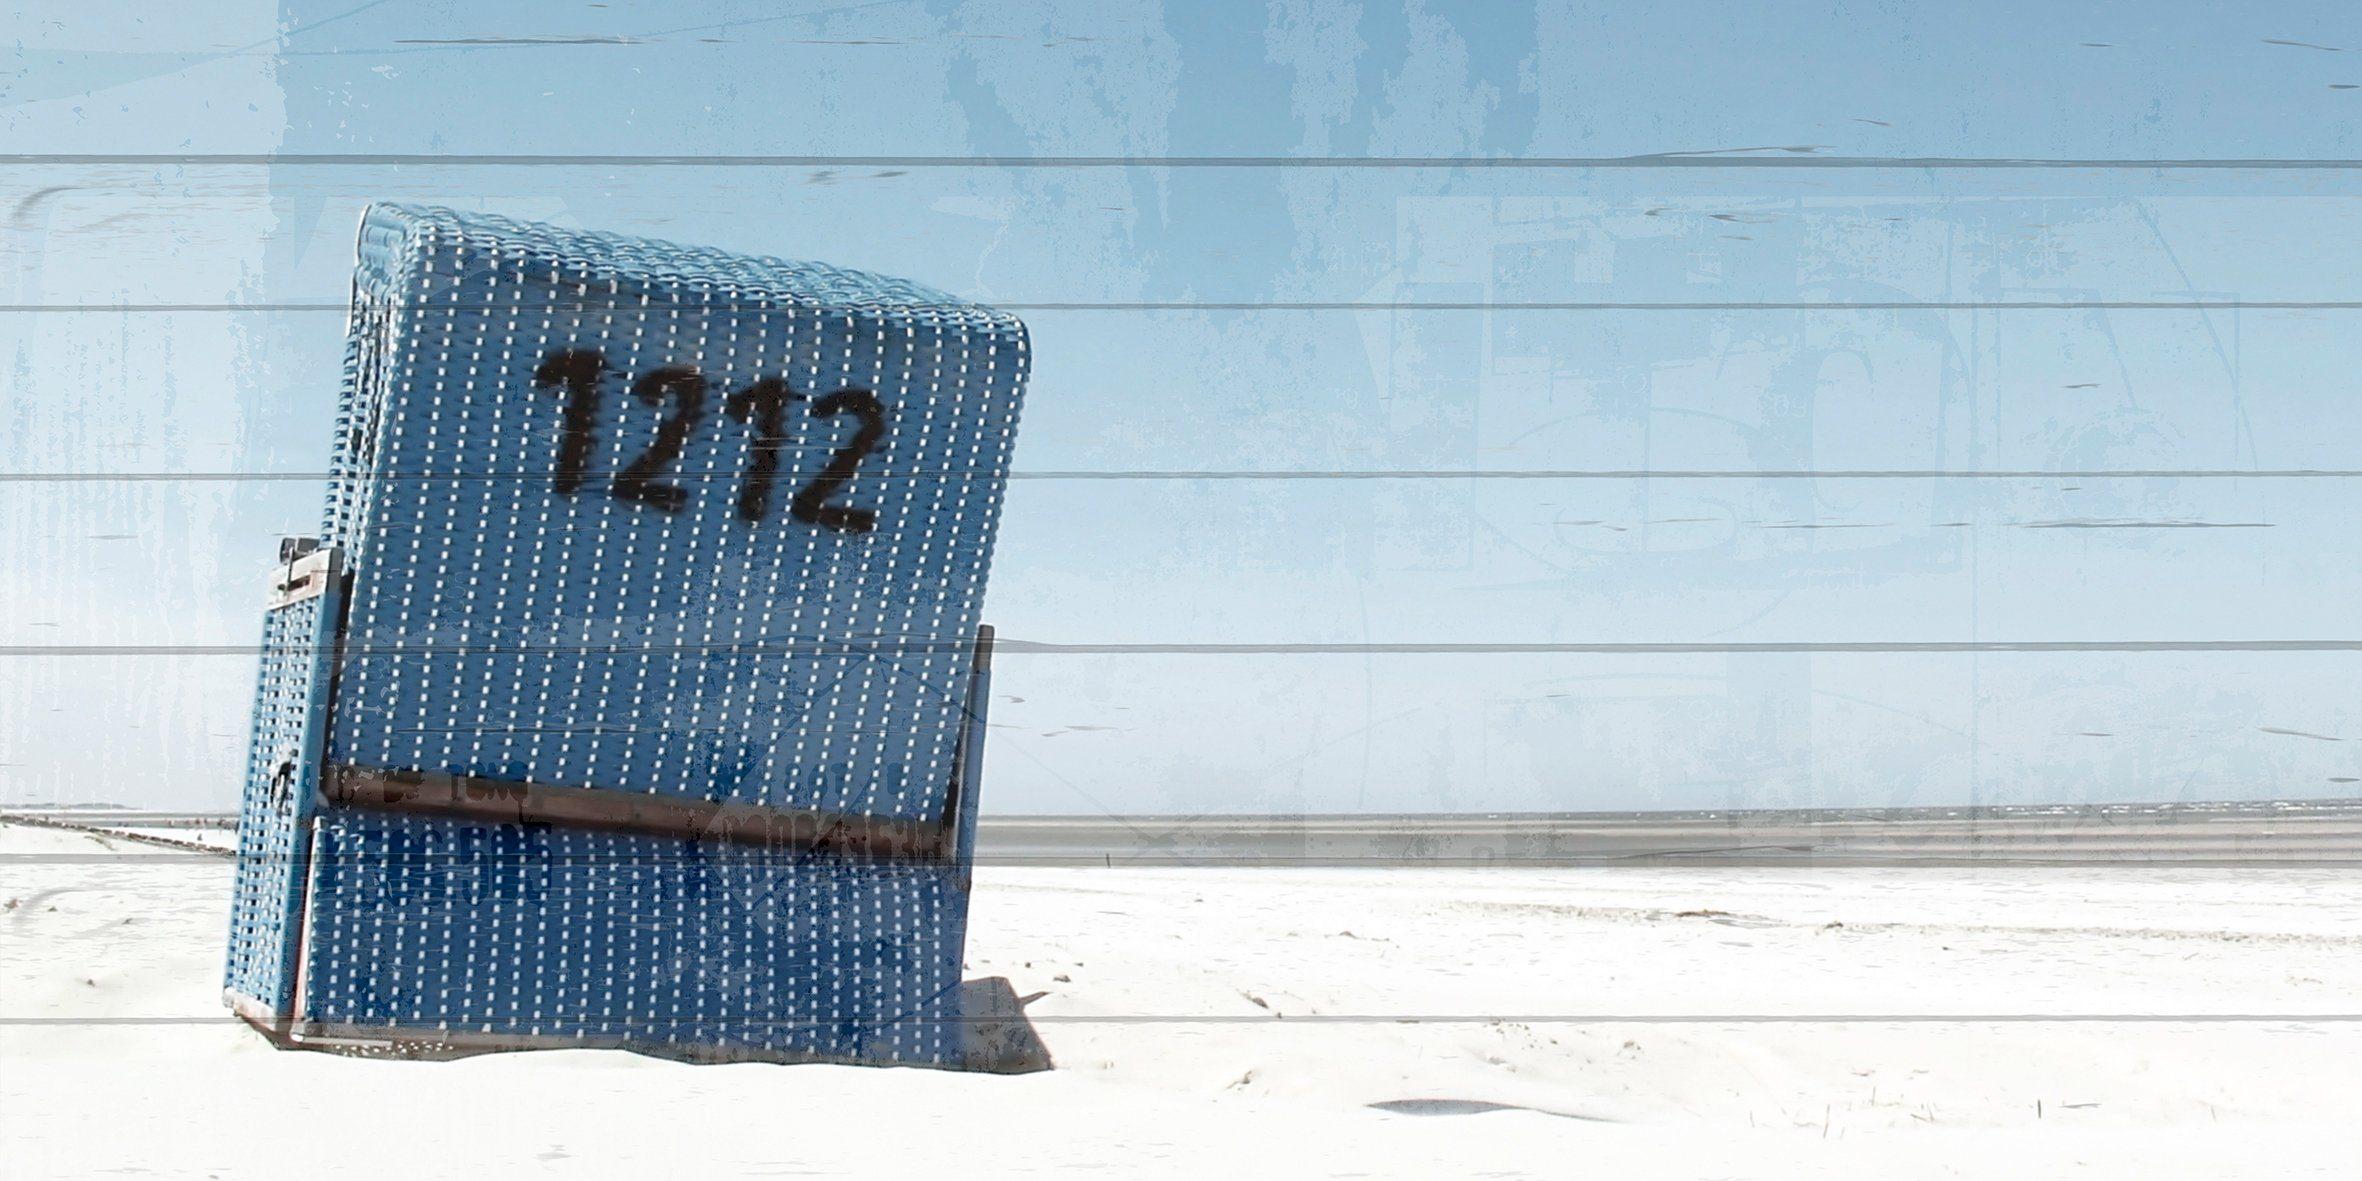 QUEENCE Holzbild »Blauer Strandkorb in Blauem Himmel«, 40x80 cm Echtholz